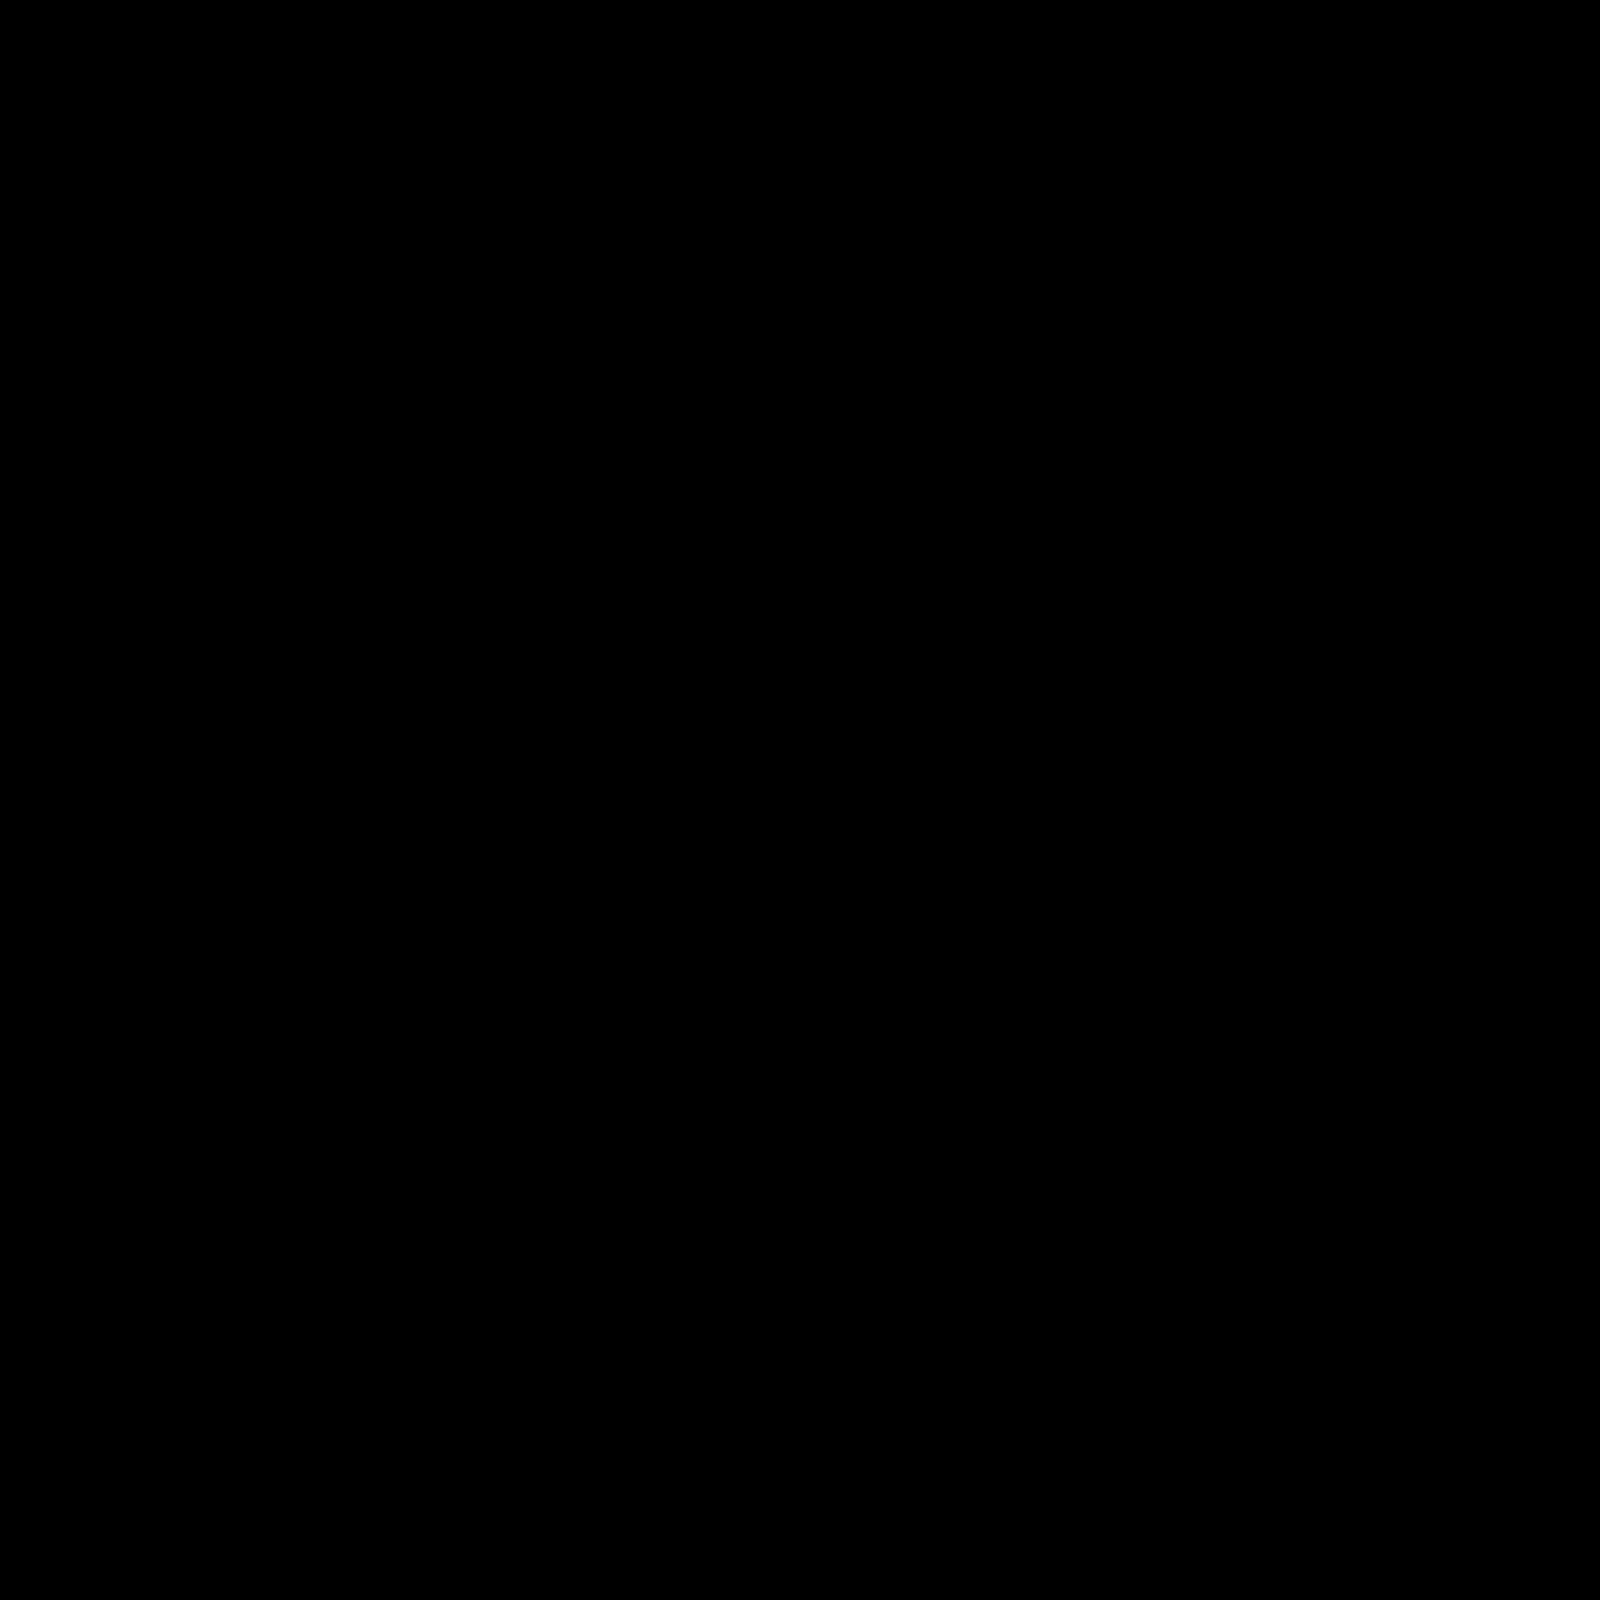 GPS Antenna icon